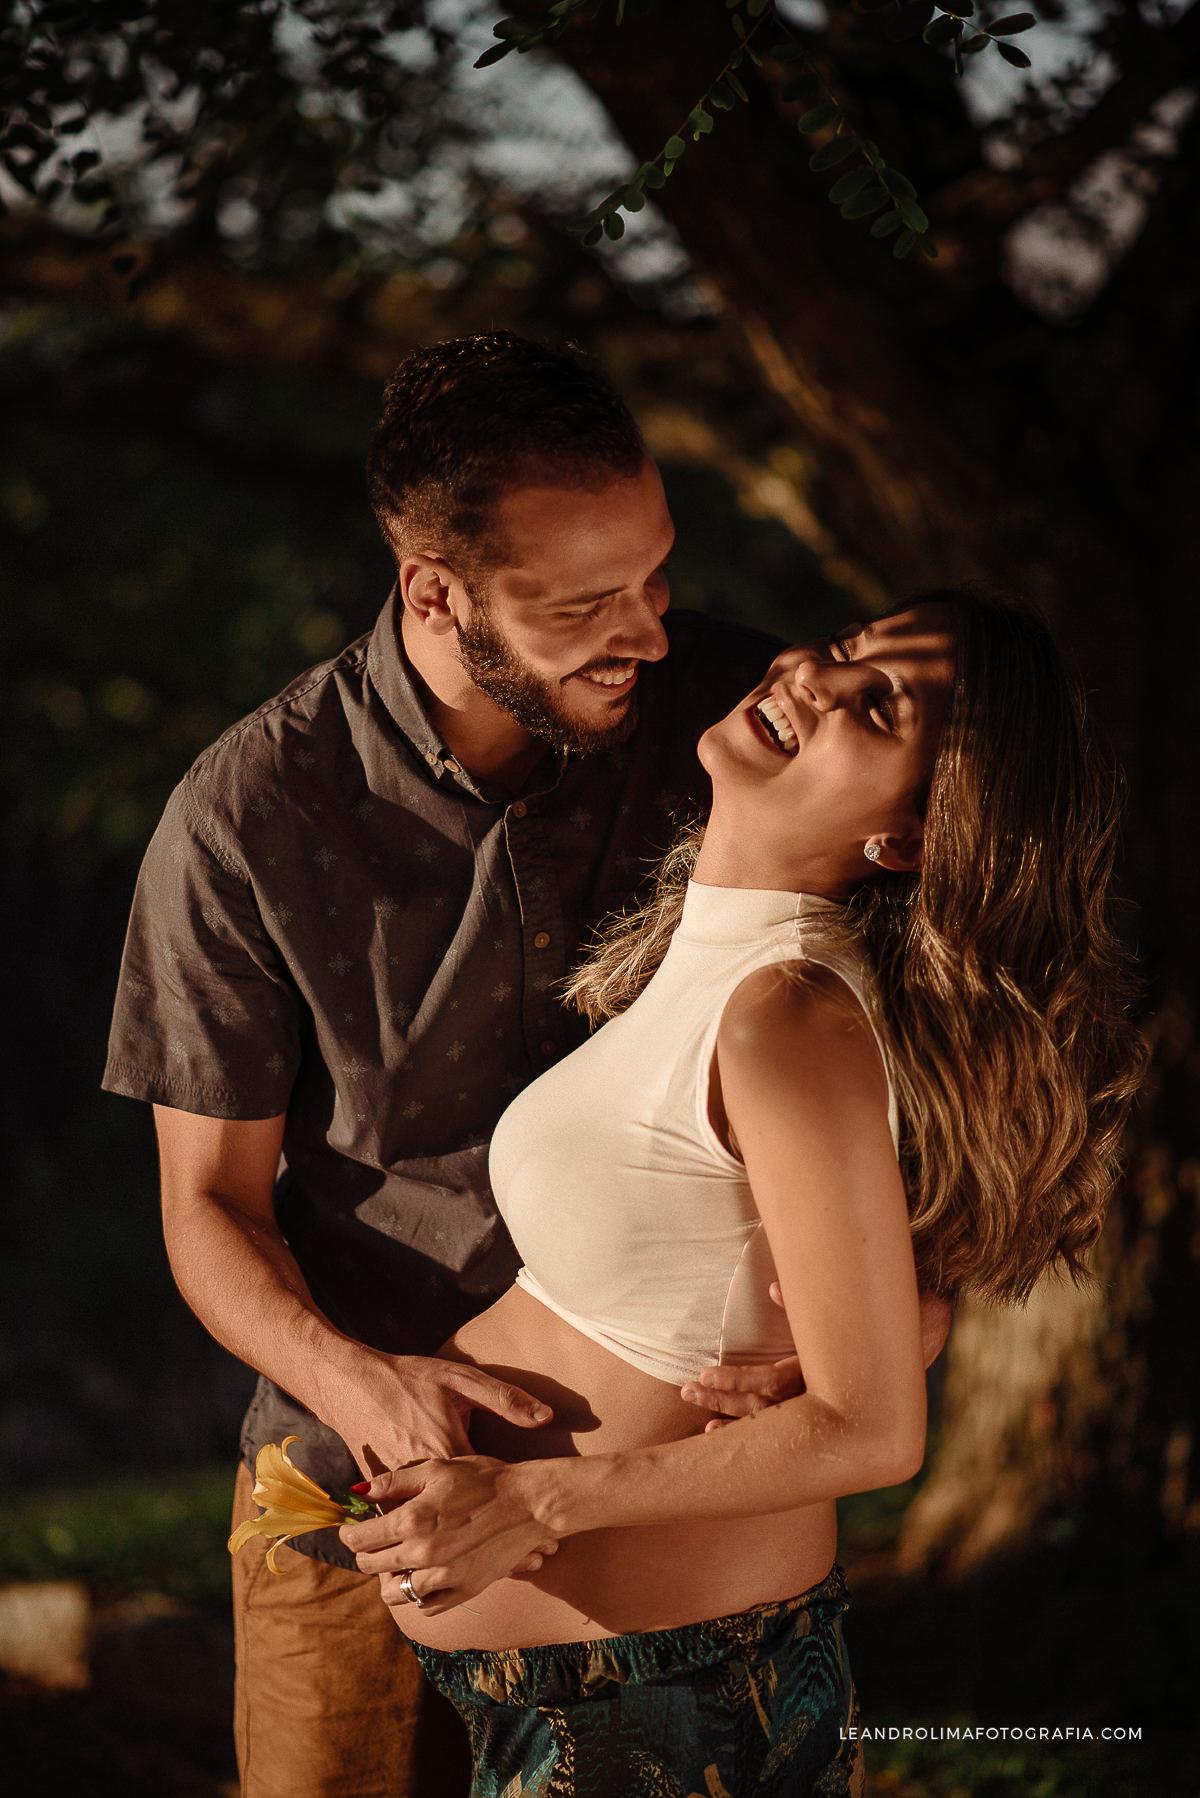 ensaio-foto-casal-gestante-gravida-mosteiro-sao-bento-vinhedo-25